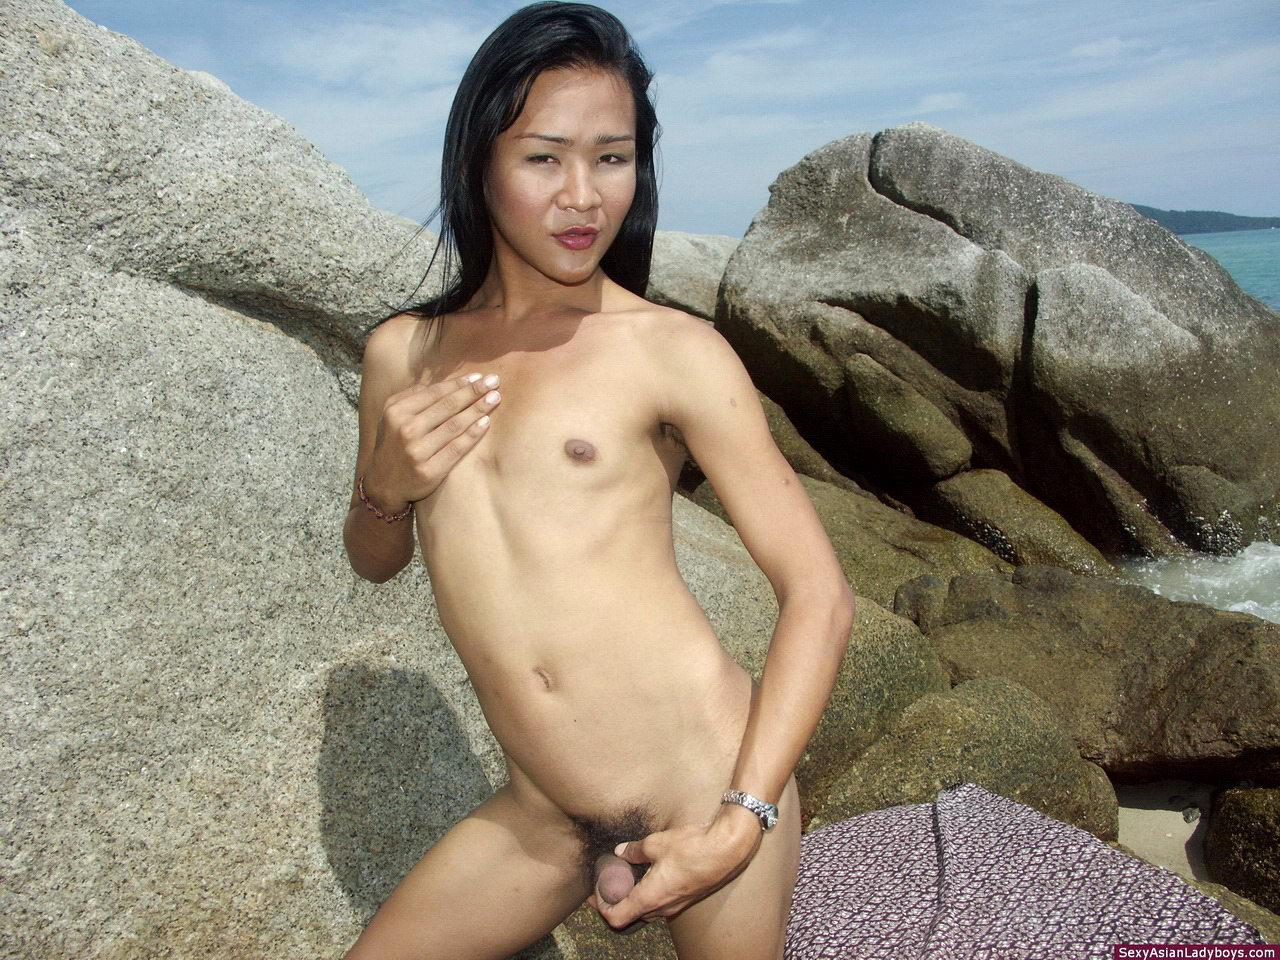 Teen Asian Femboy Wanks And Shoots Hot Cum Like A Fountain